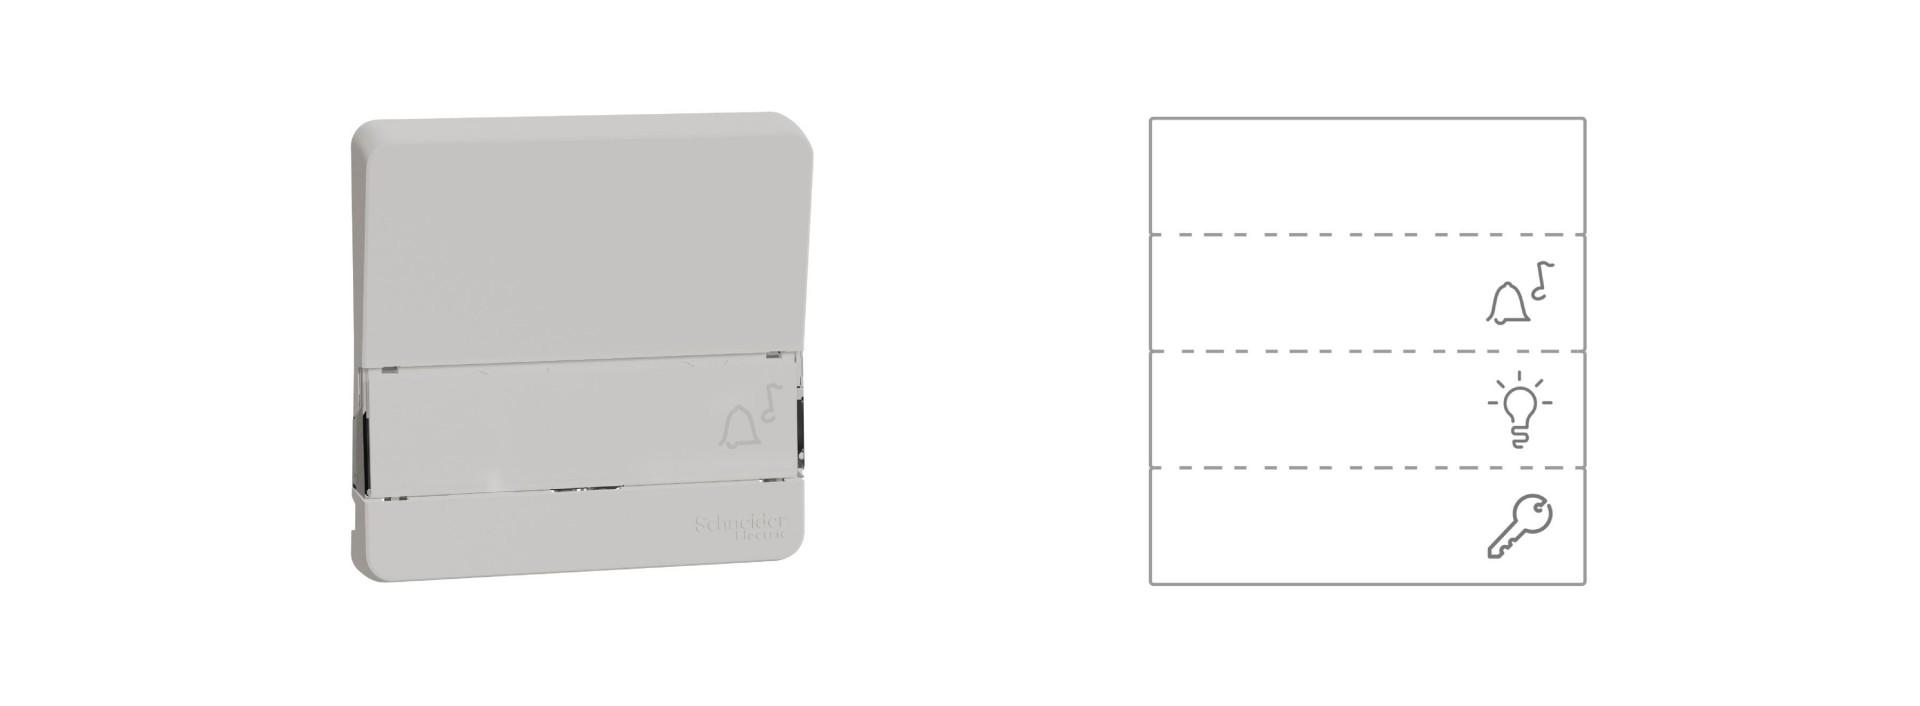 Accessoires Mureva Styl SCHNEIDER - E-PLANETELEC